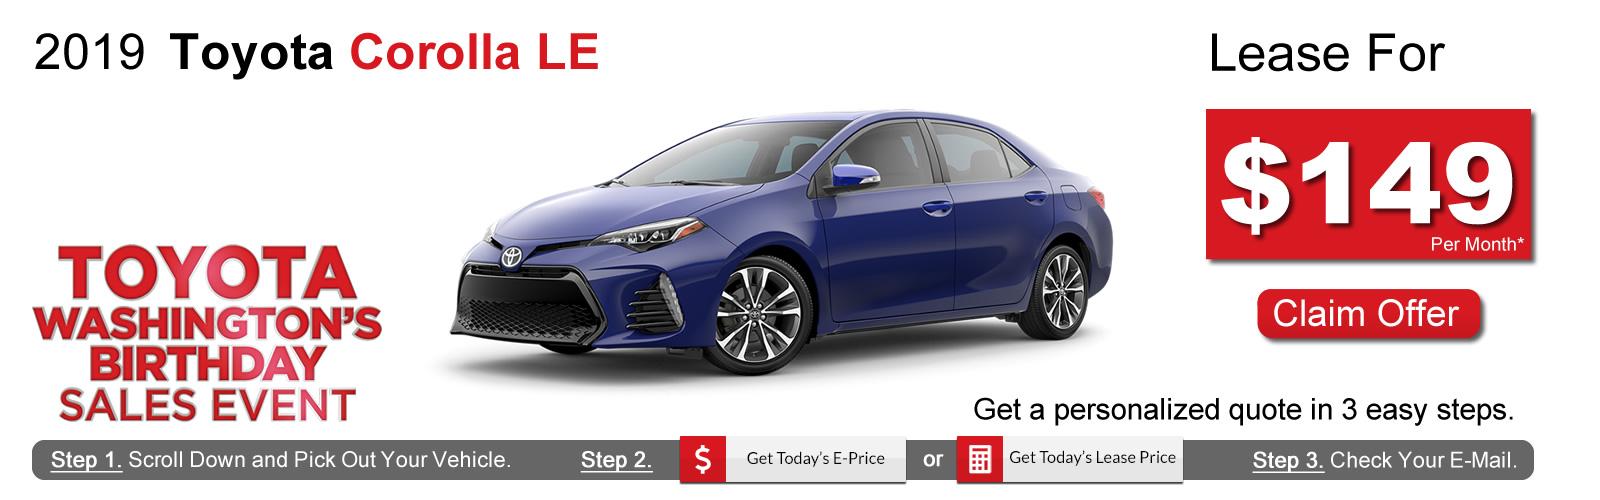 2019 Toyota Corolla Lease Deals near Boston, MA